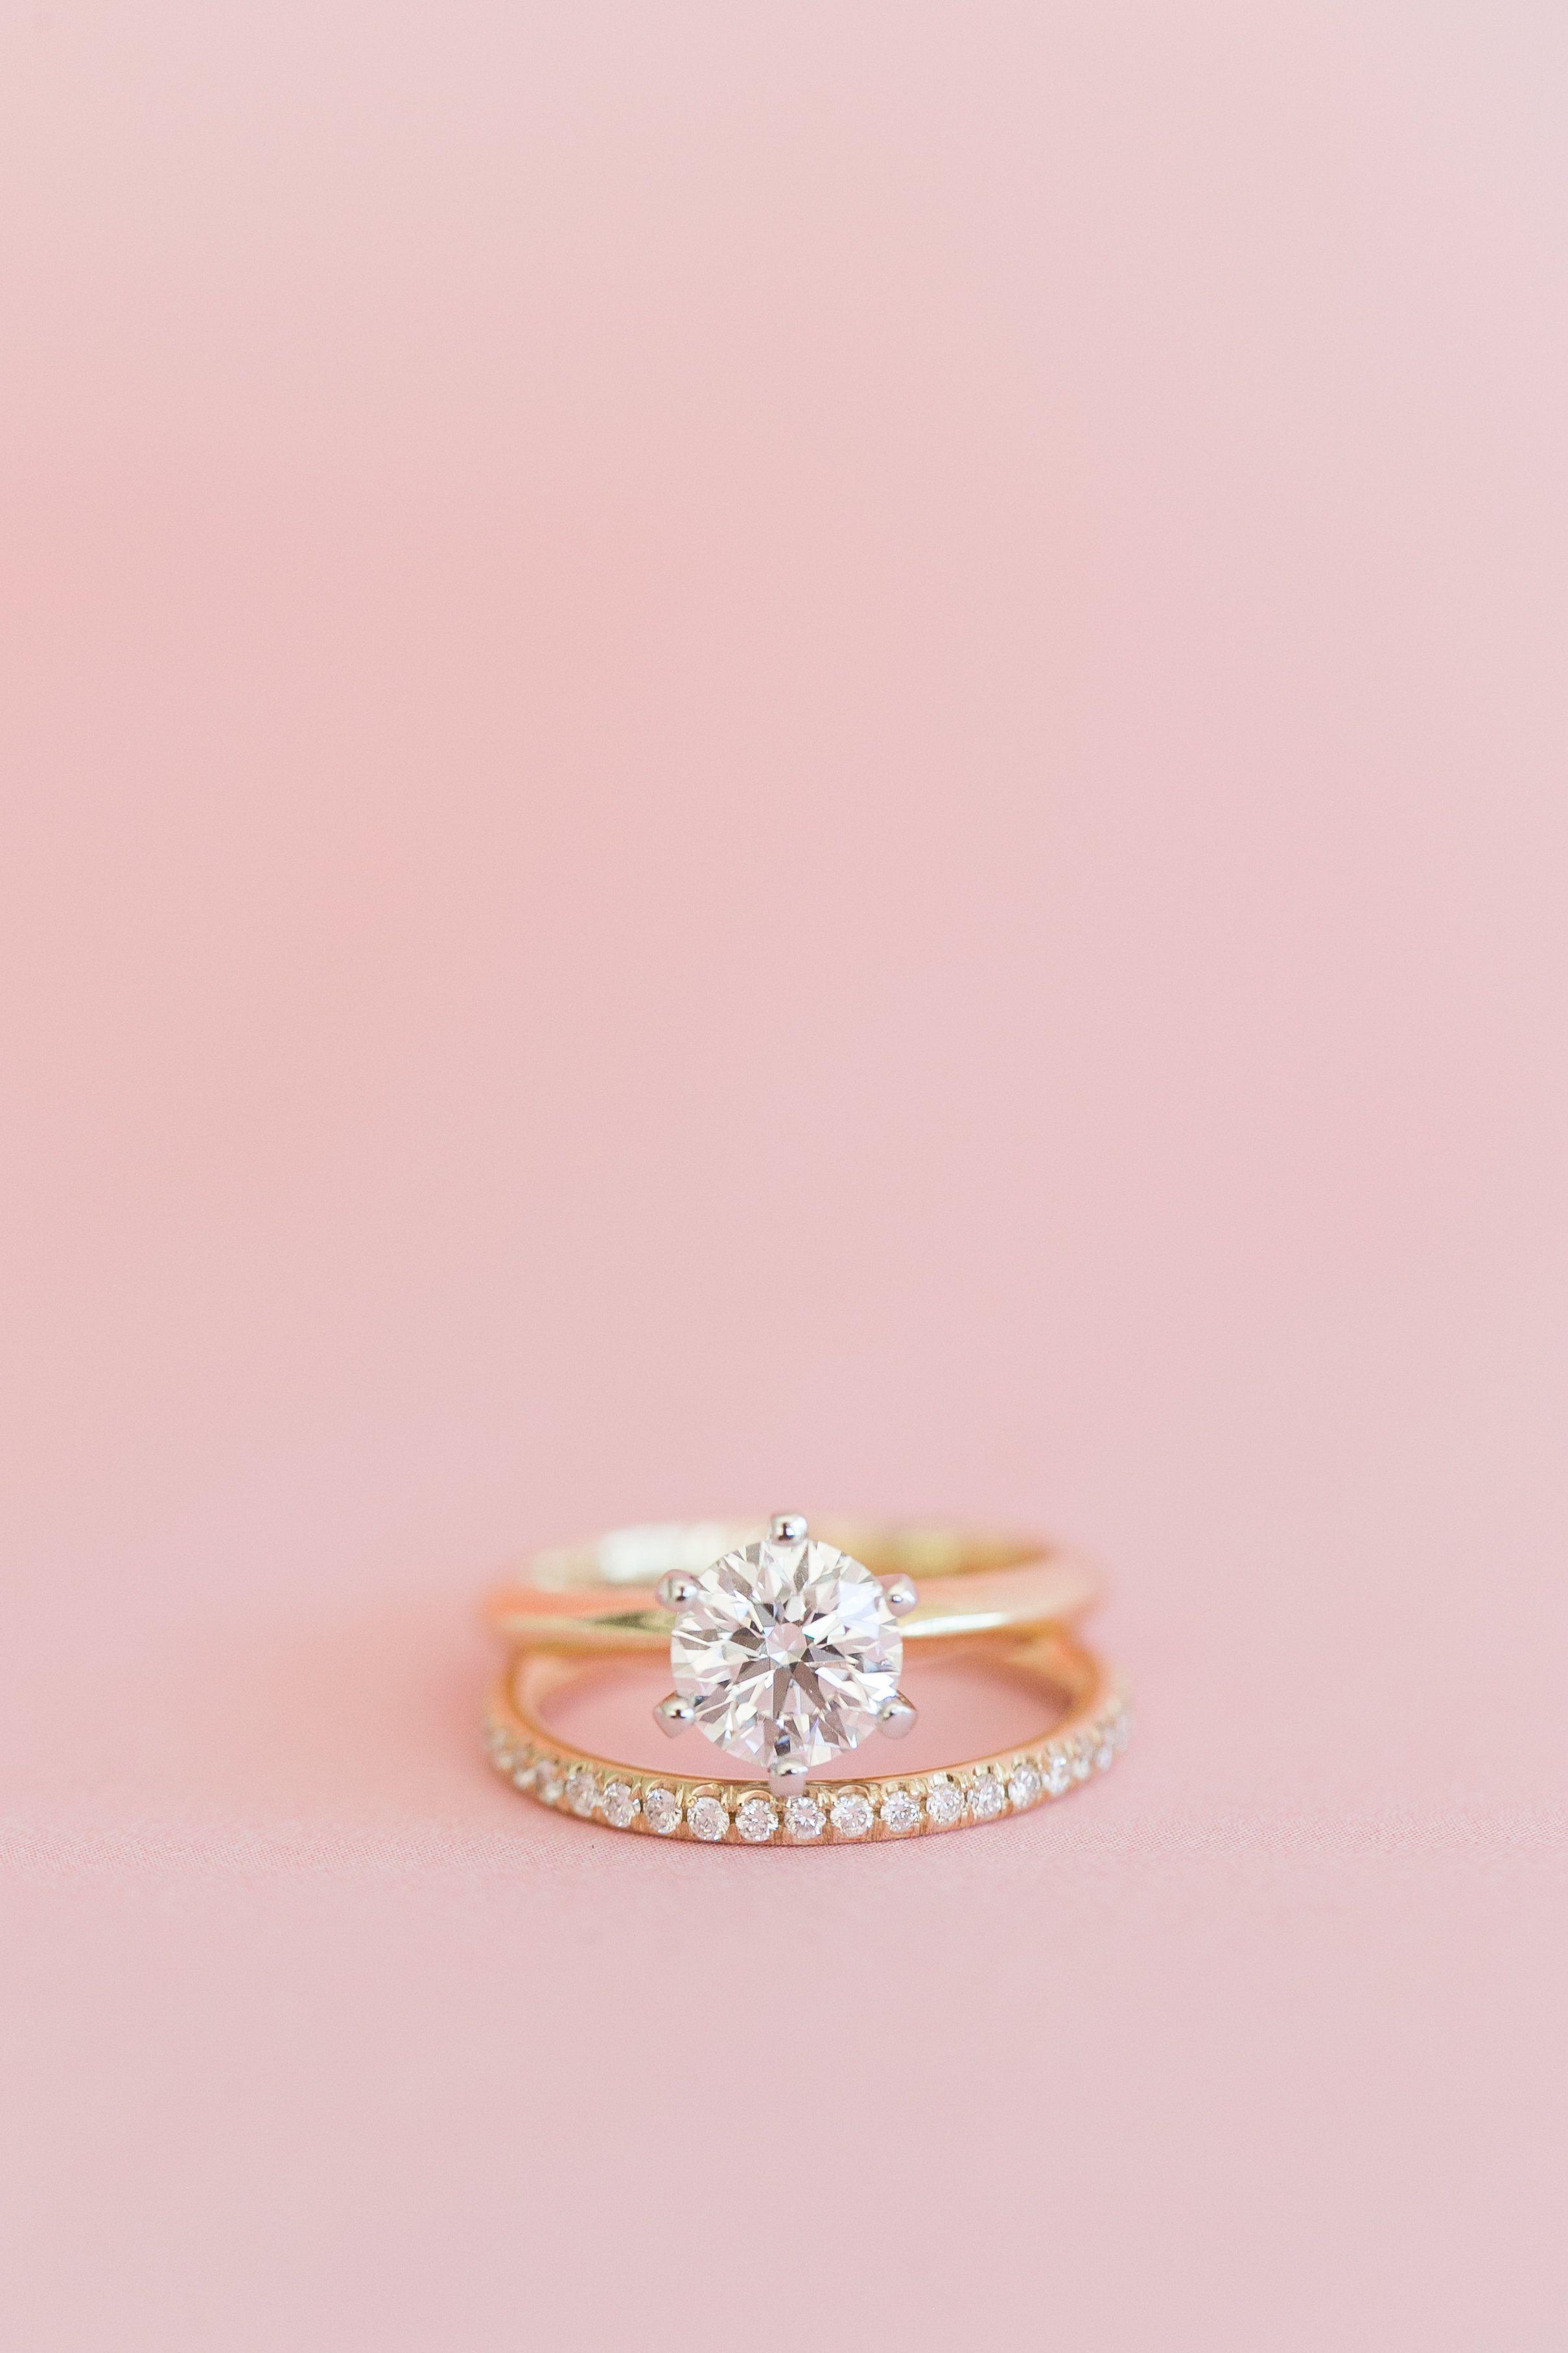 Beautiful gold engagement + wedding ring #engagementrings | My ...